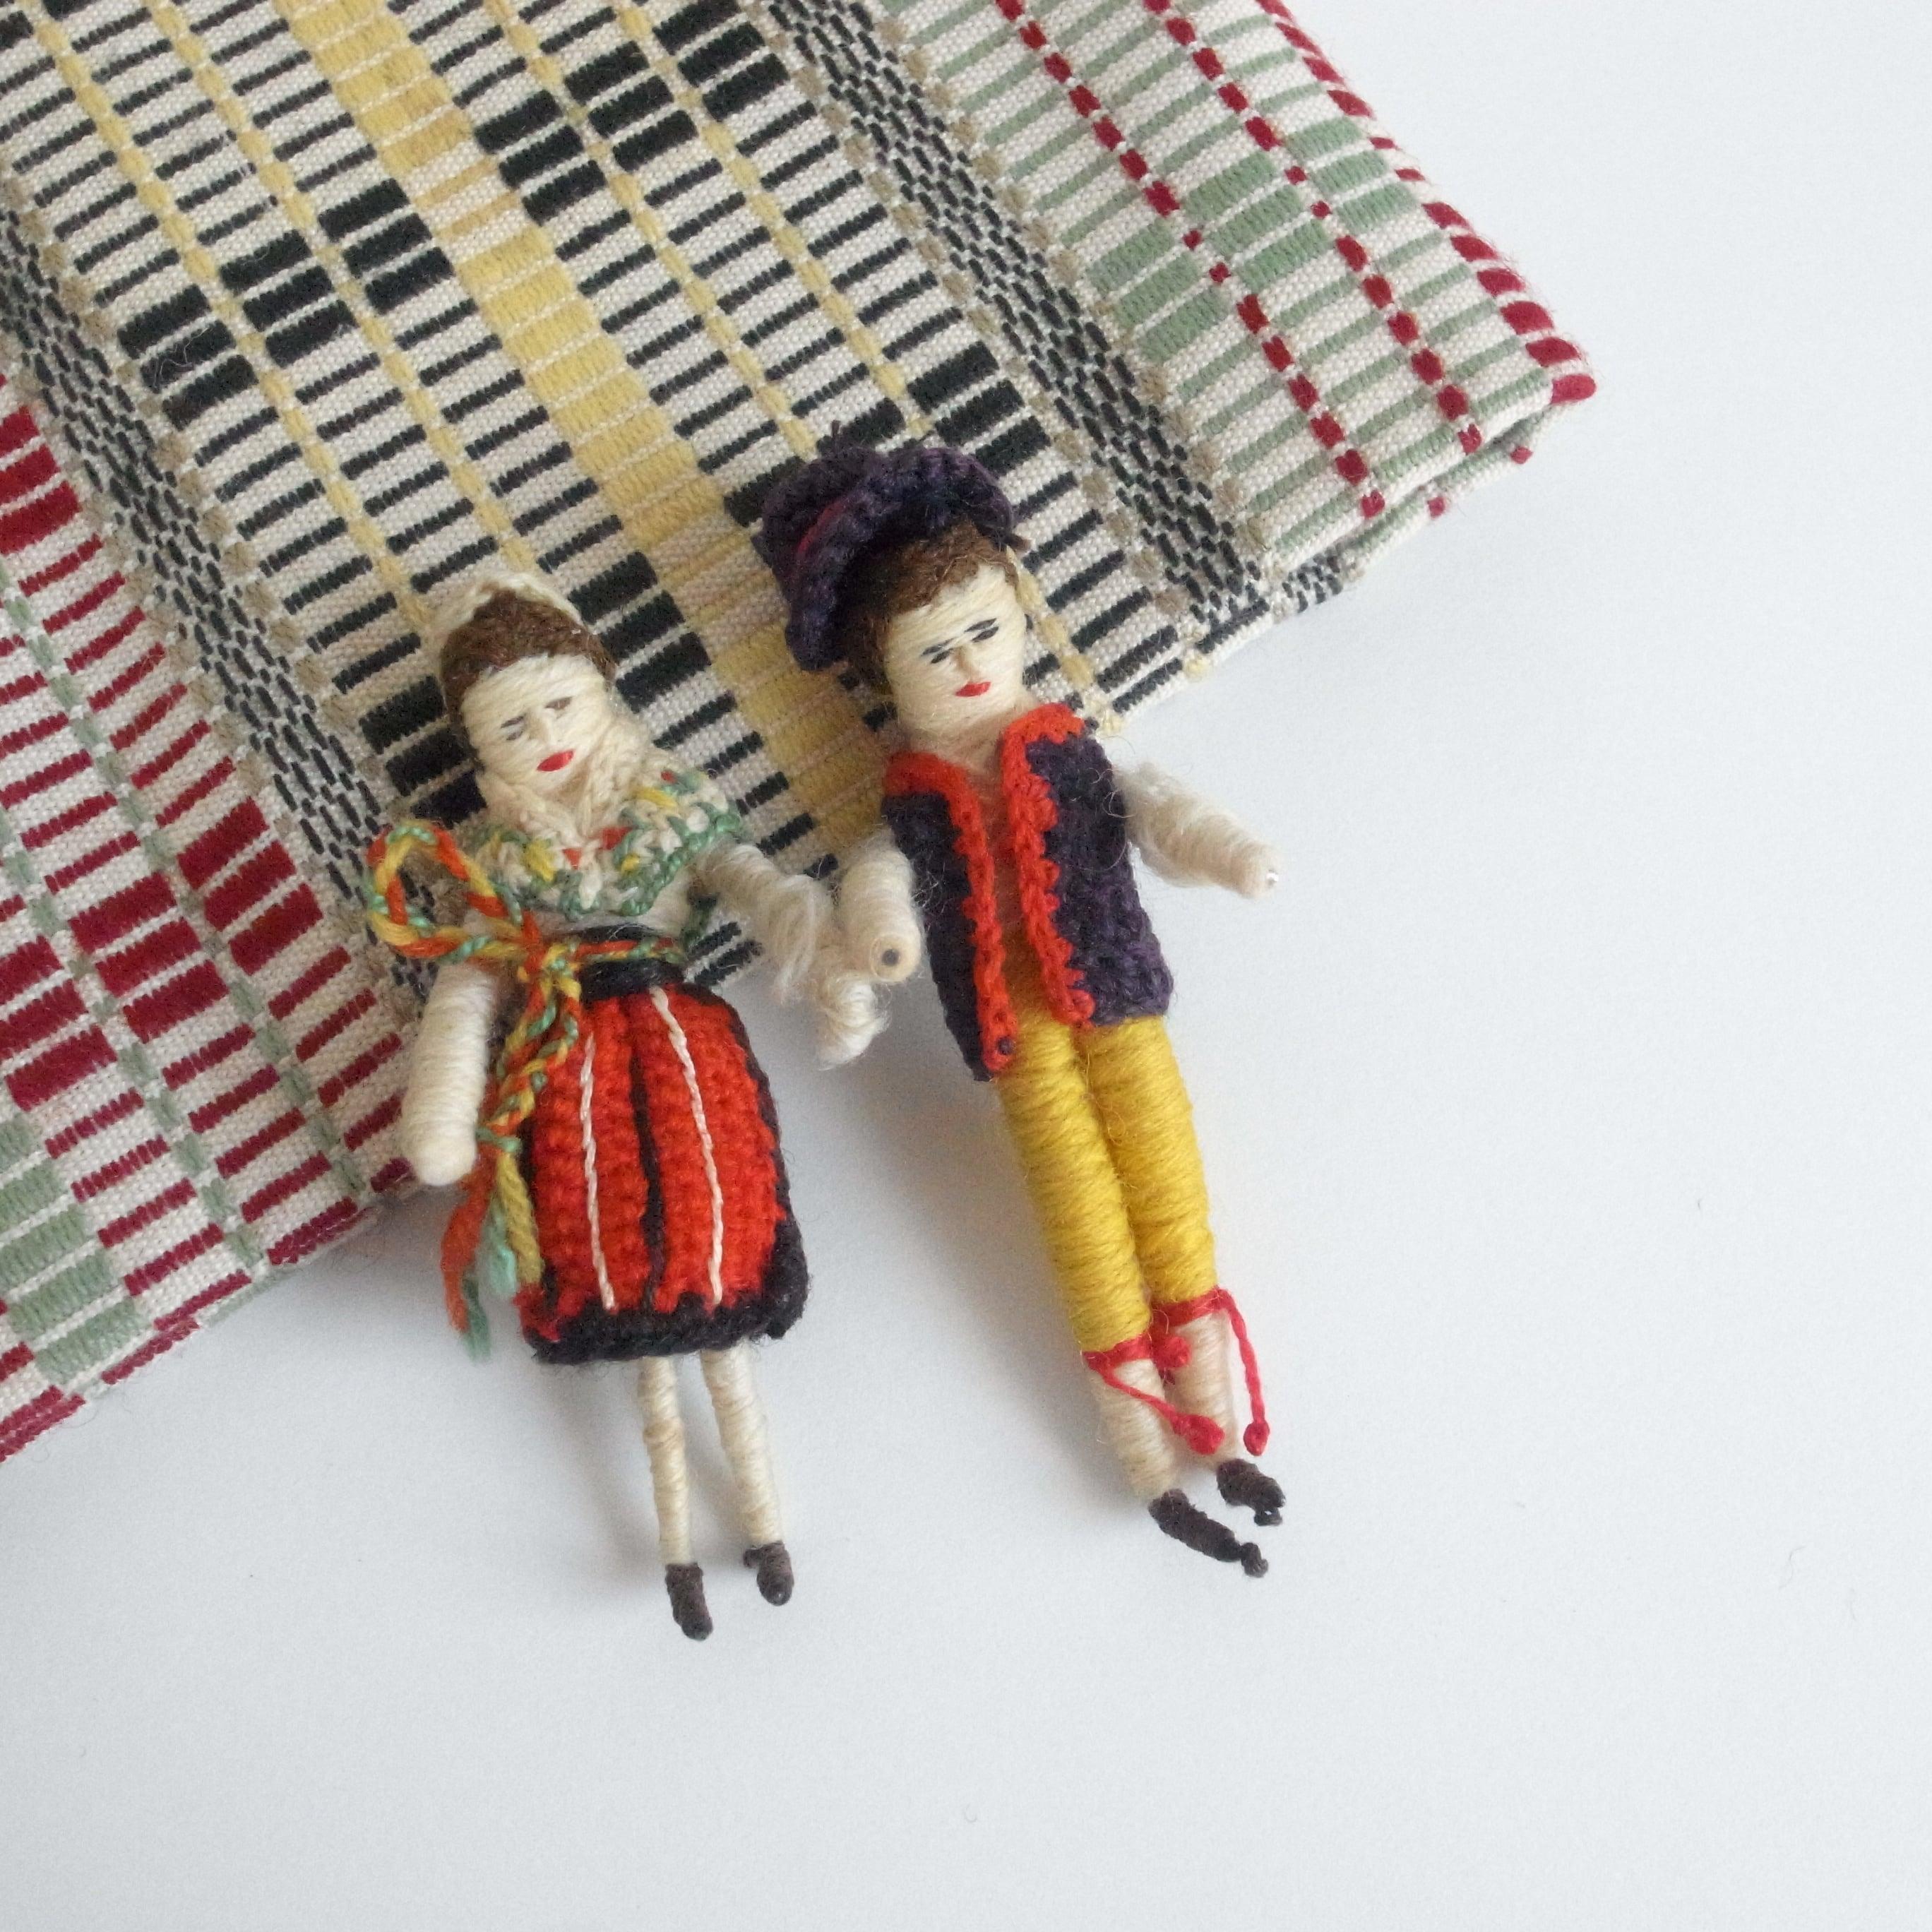 Handmade traditional Costume doll / Rättvik